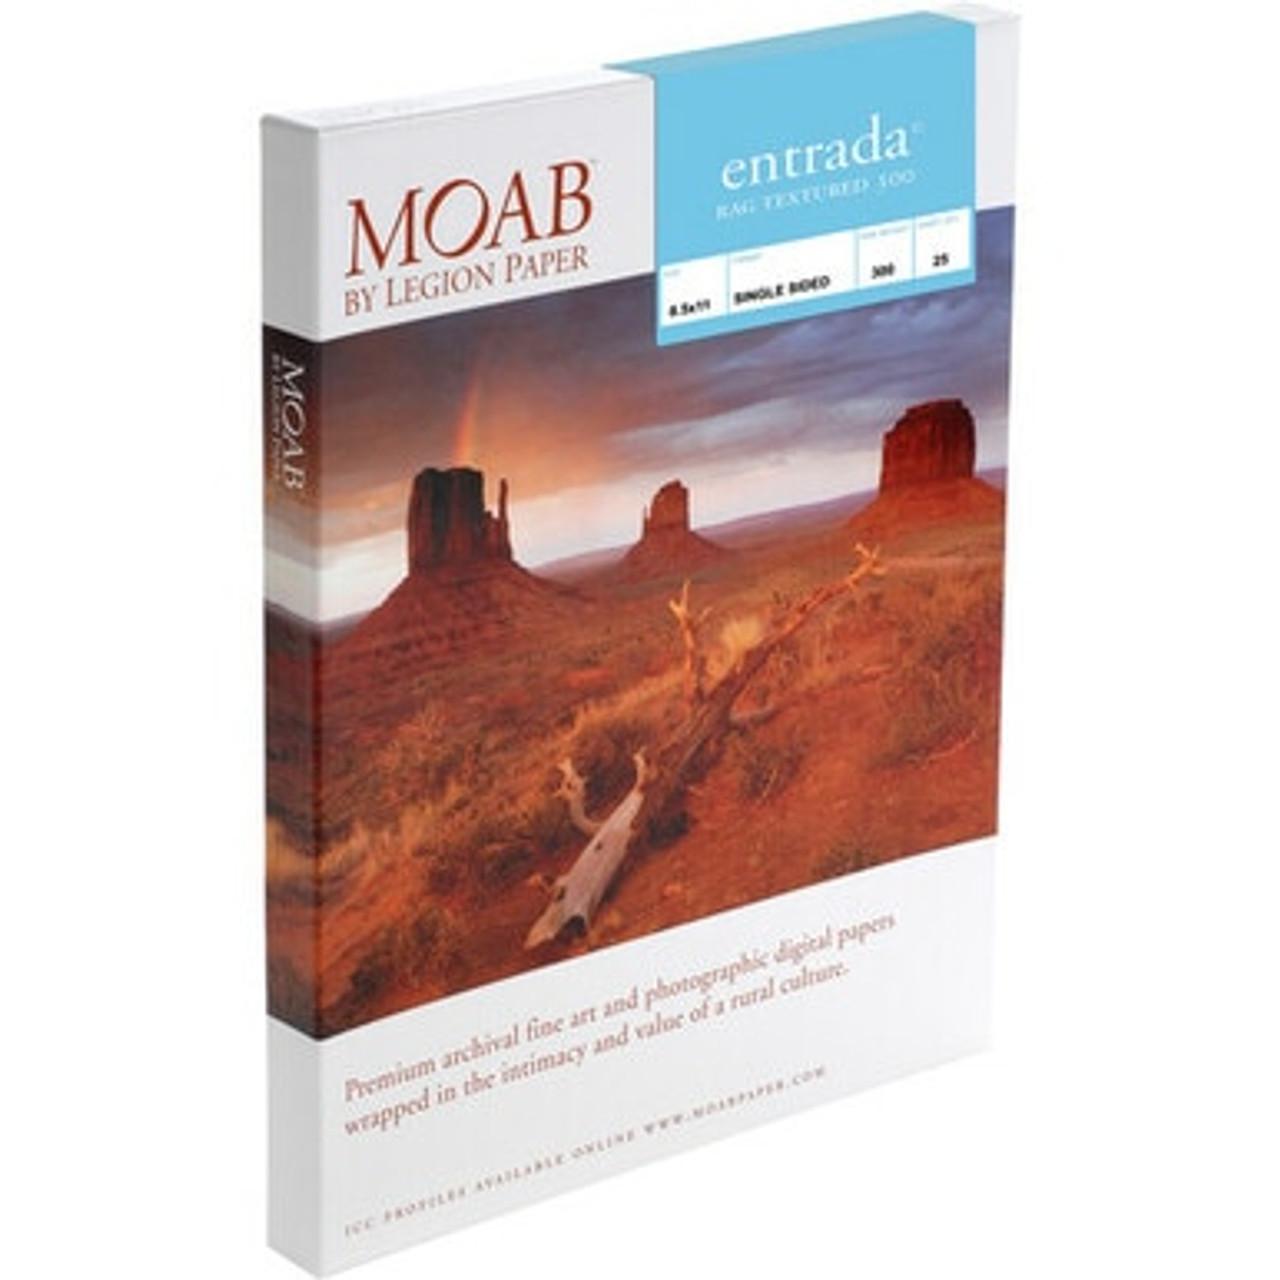 MOAB ENTRADA RAG TEXTURED 300 (13X19)(25 SHEETS)